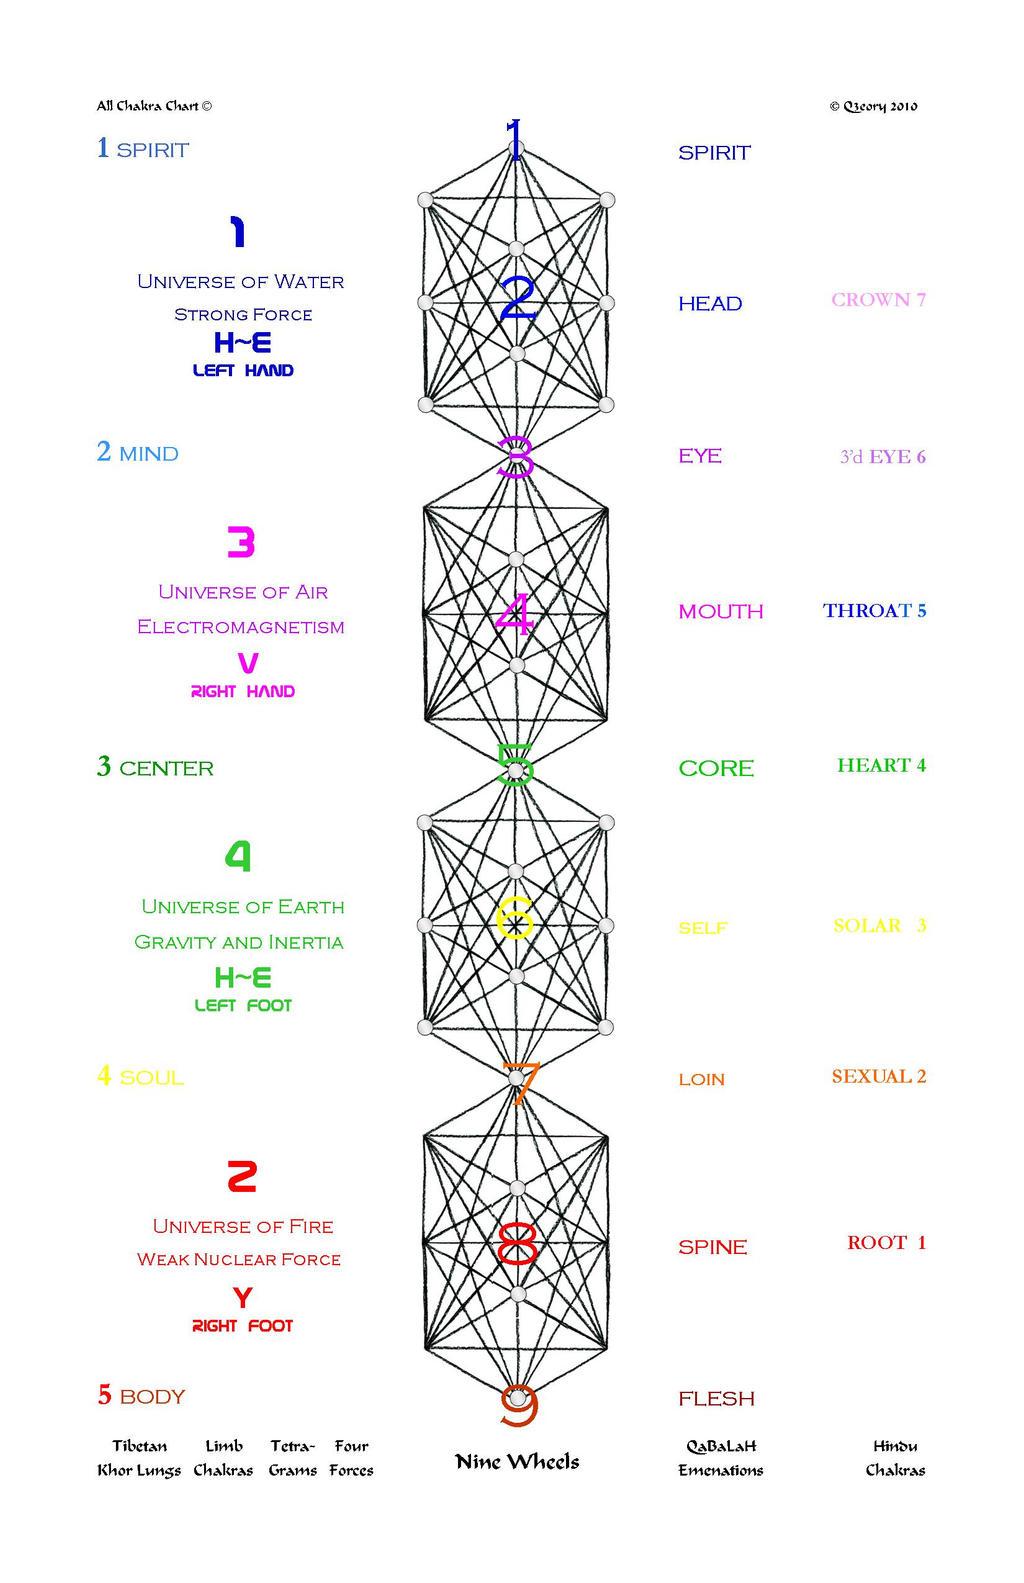 All Chakra Chart By Q3eory On Deviantart